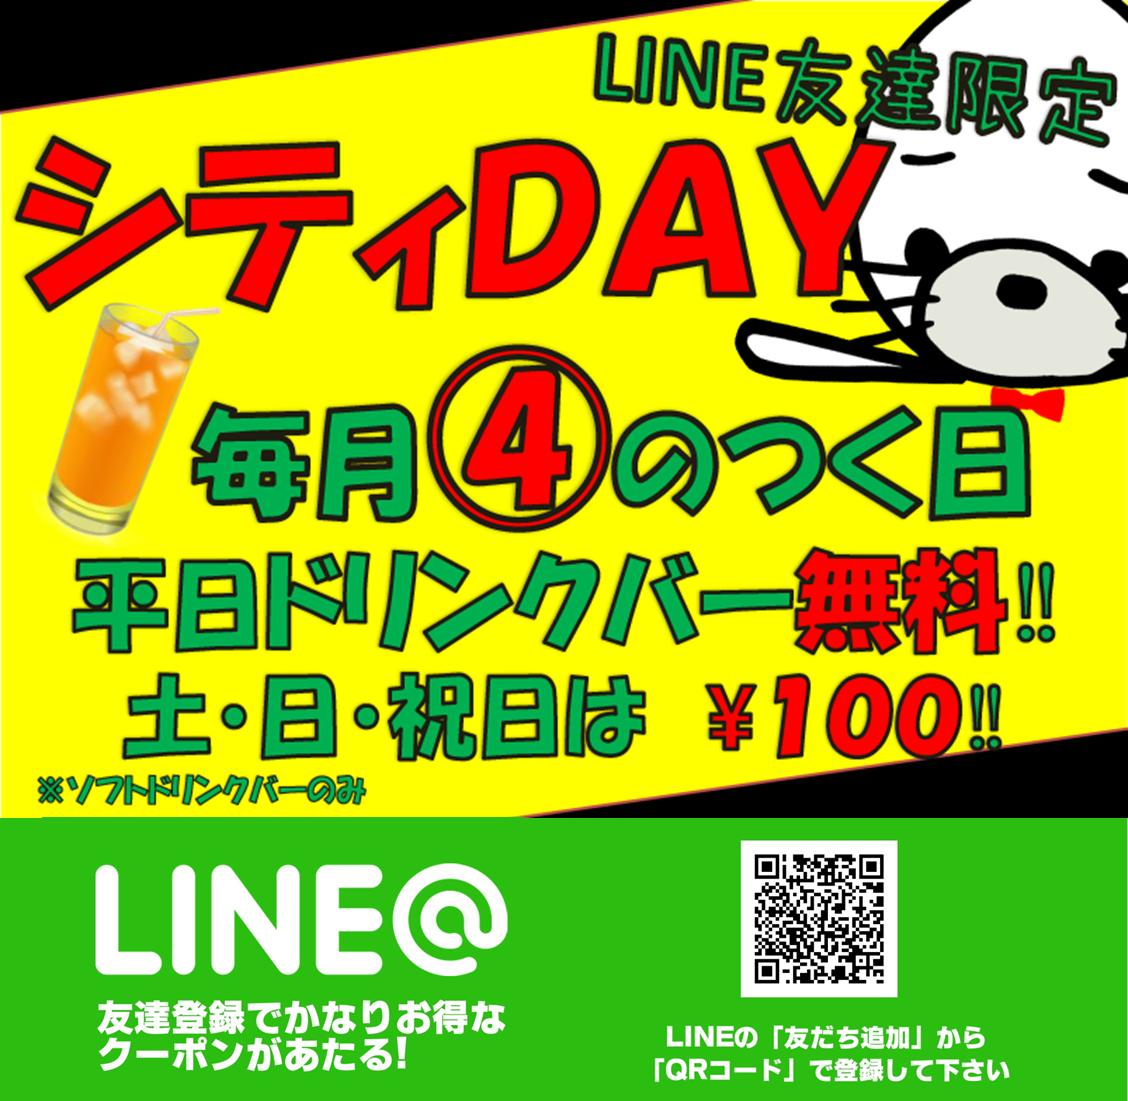 LINE友達限定シティDAY